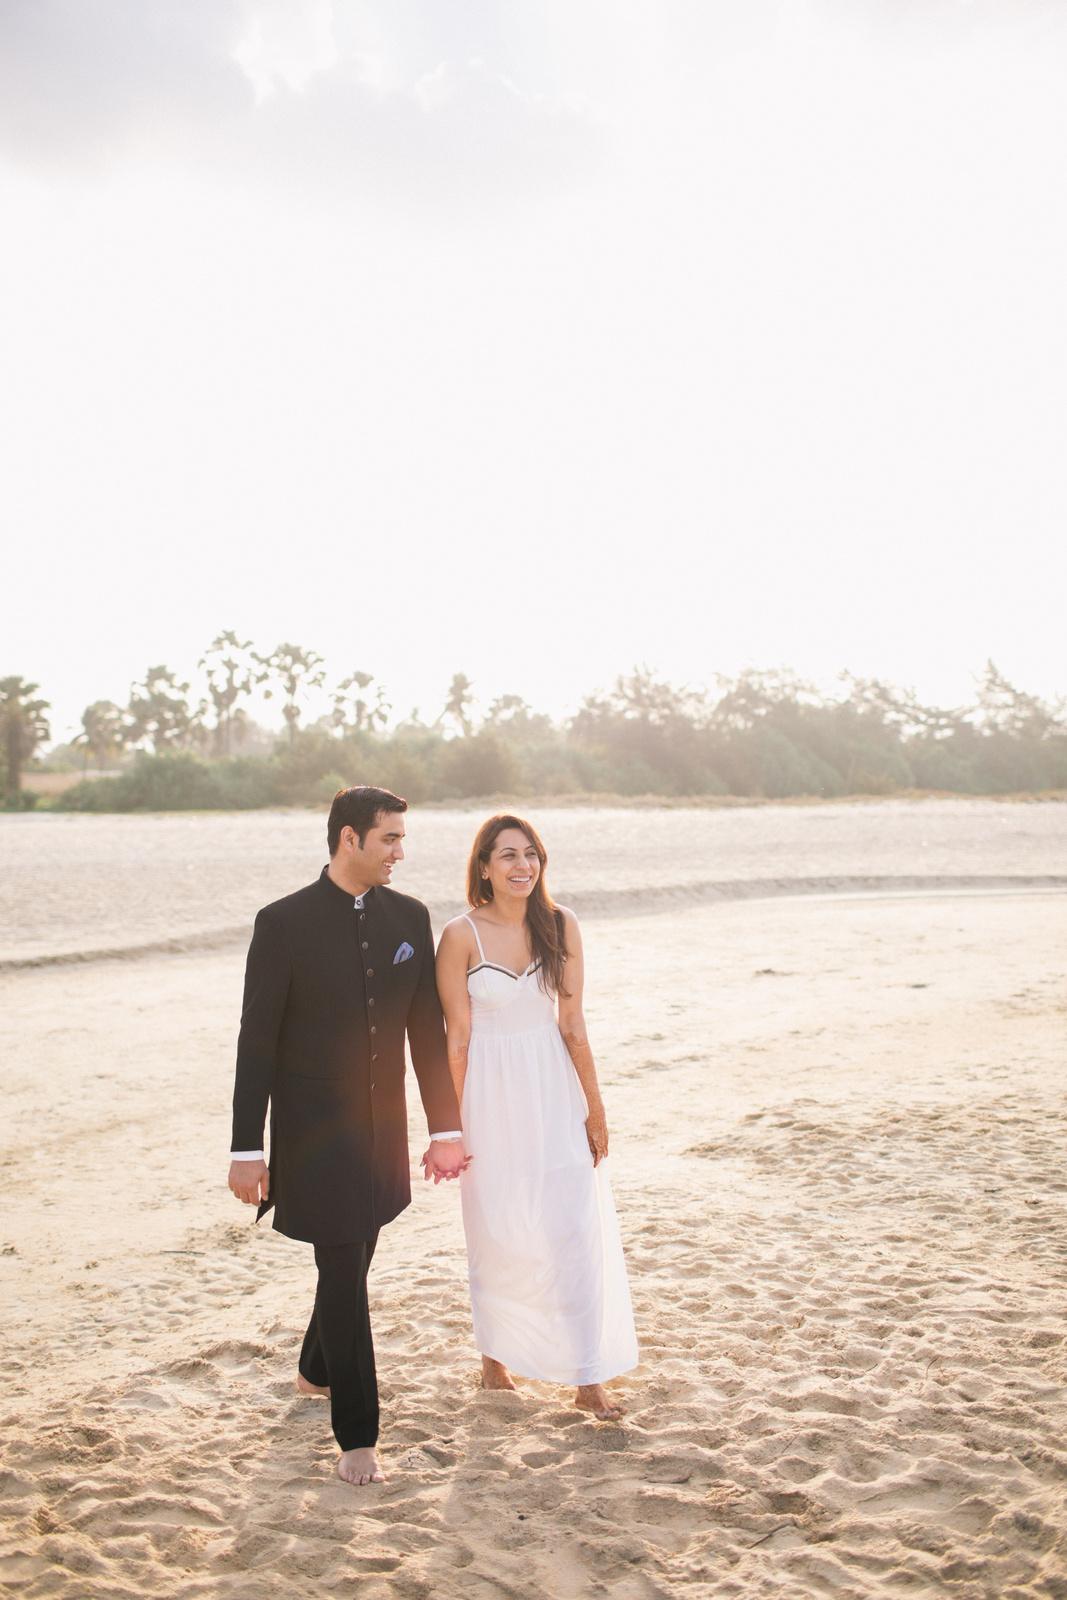 goa-beach-pre-wedding-couple-session-into-candid-photography-mk-10.jpg